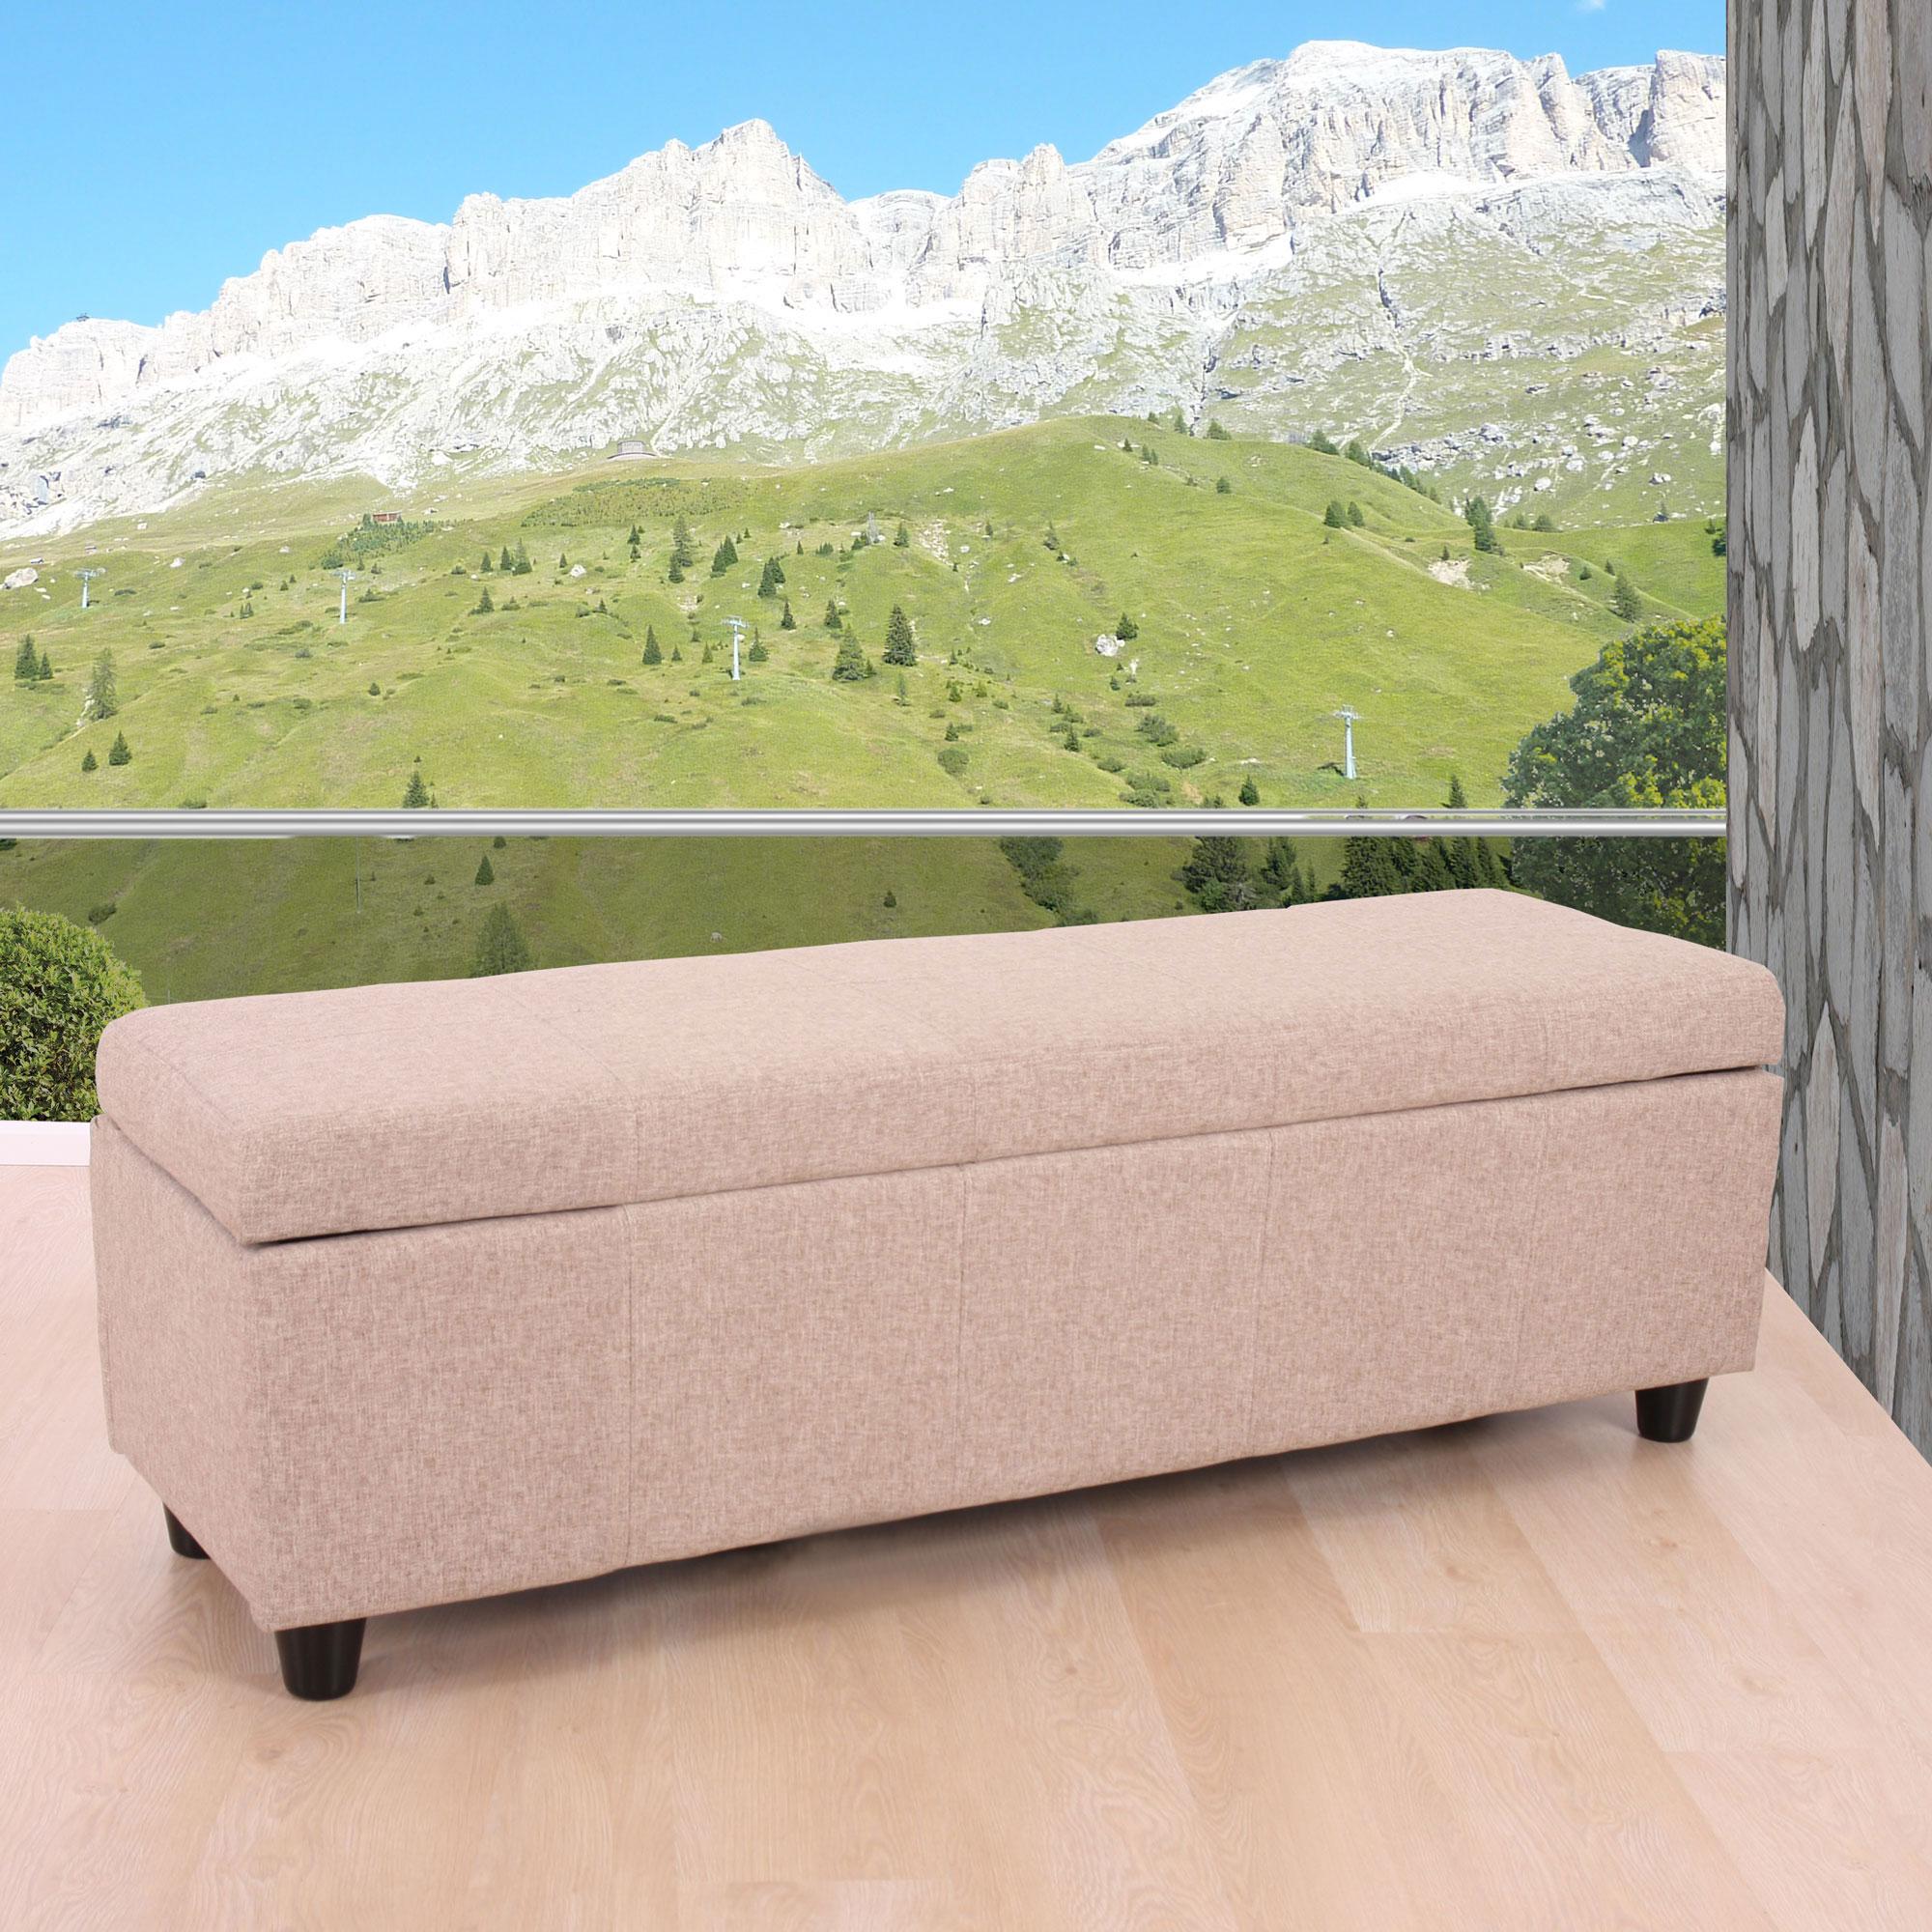 aufbewahrungs truhe sitzbank bank kriens textil 112x45x45cm beige. Black Bedroom Furniture Sets. Home Design Ideas